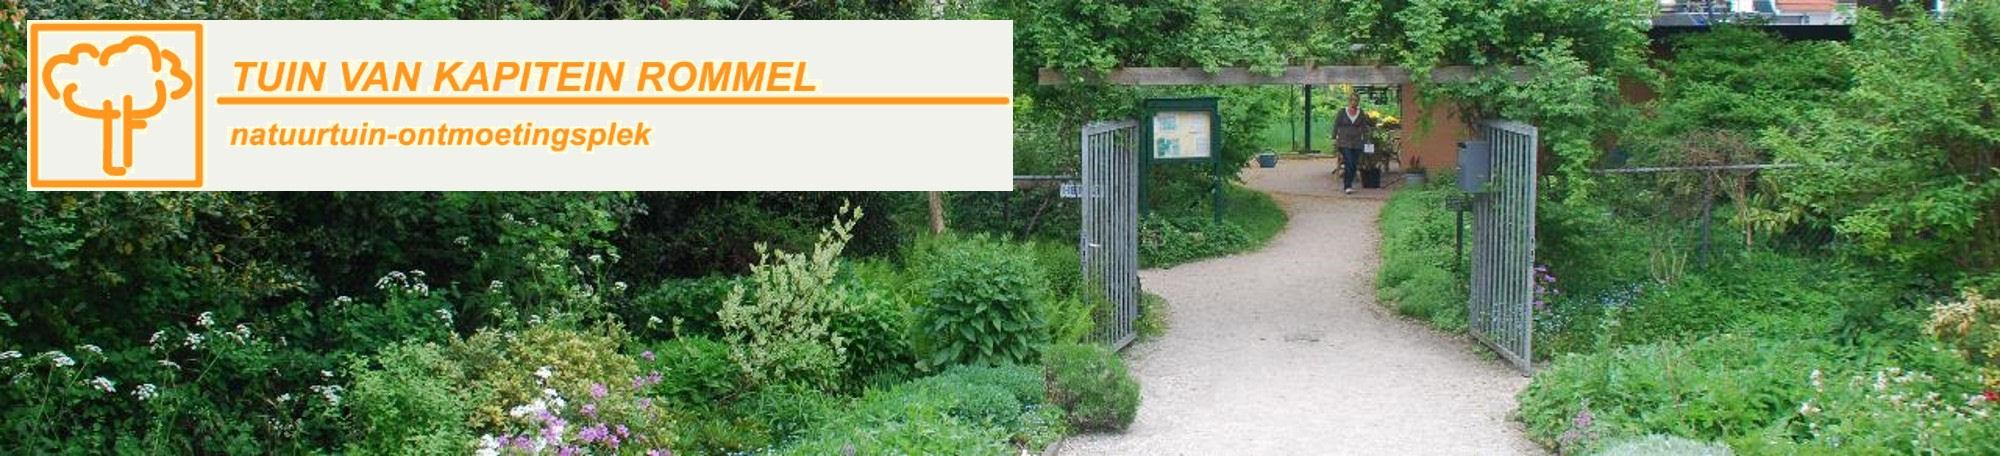 Tuin van Kapitein Rommel-Banner